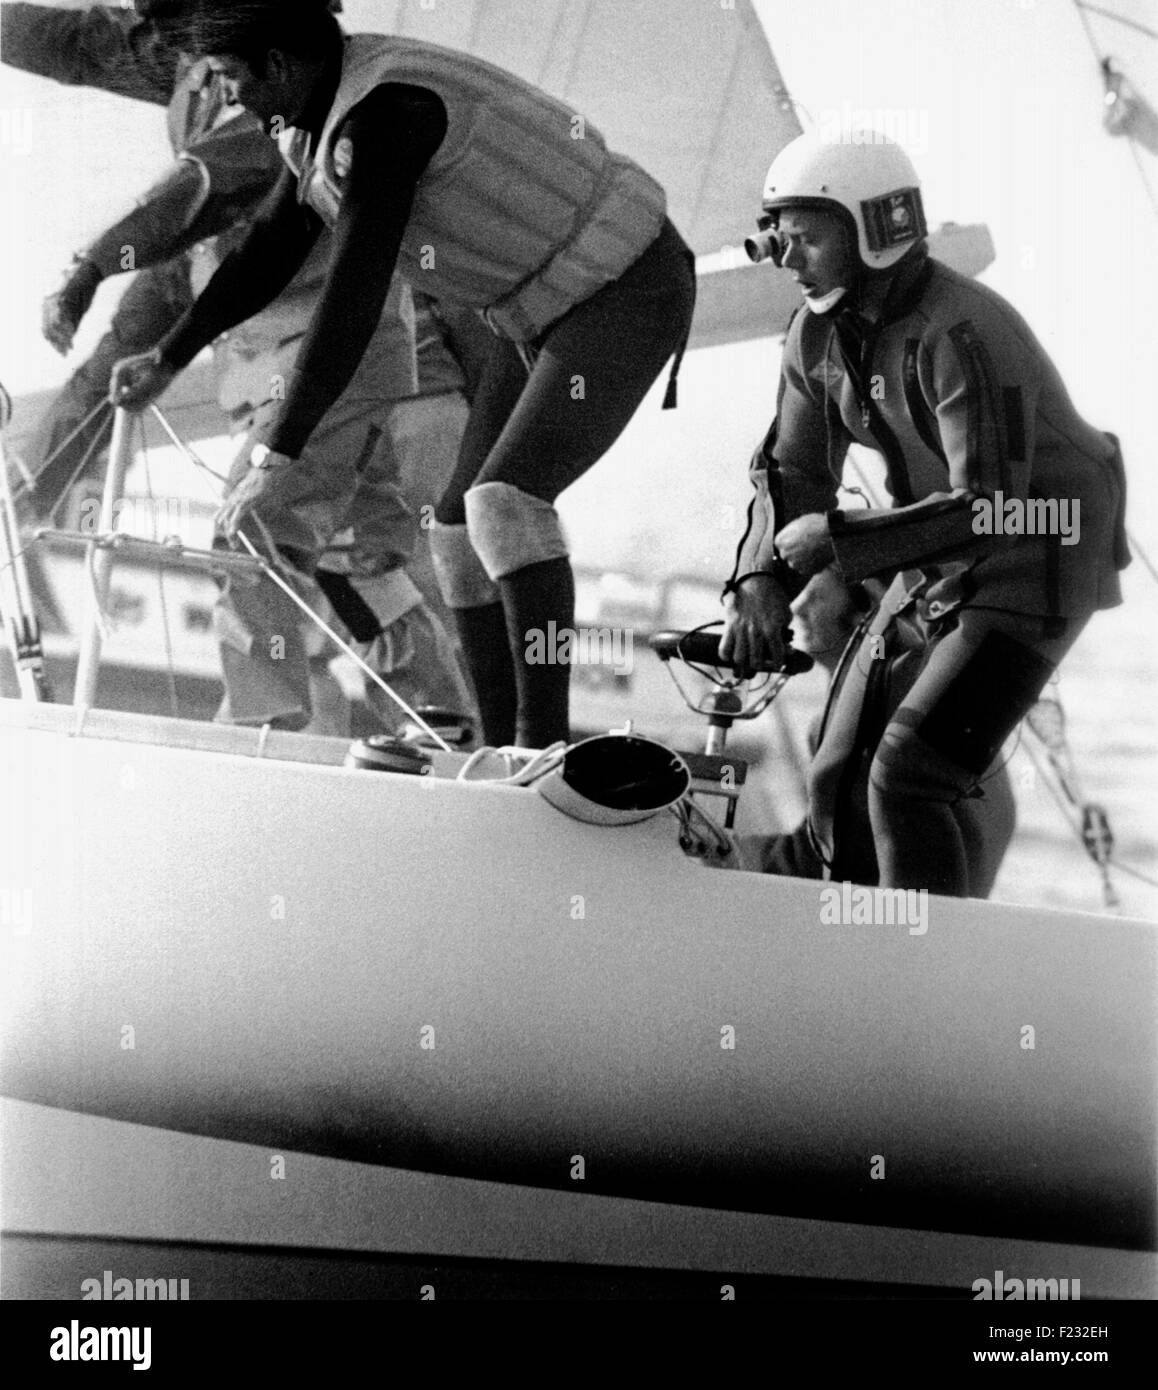 AJAX NEWS PHOTOS - 13TH OCT, 1978. WEYMOUTH,ENGLAND.  - SPEED WEEK - AMERICAN SAILING SPEED CATAMARAN SLINGSHOT - Stock Image